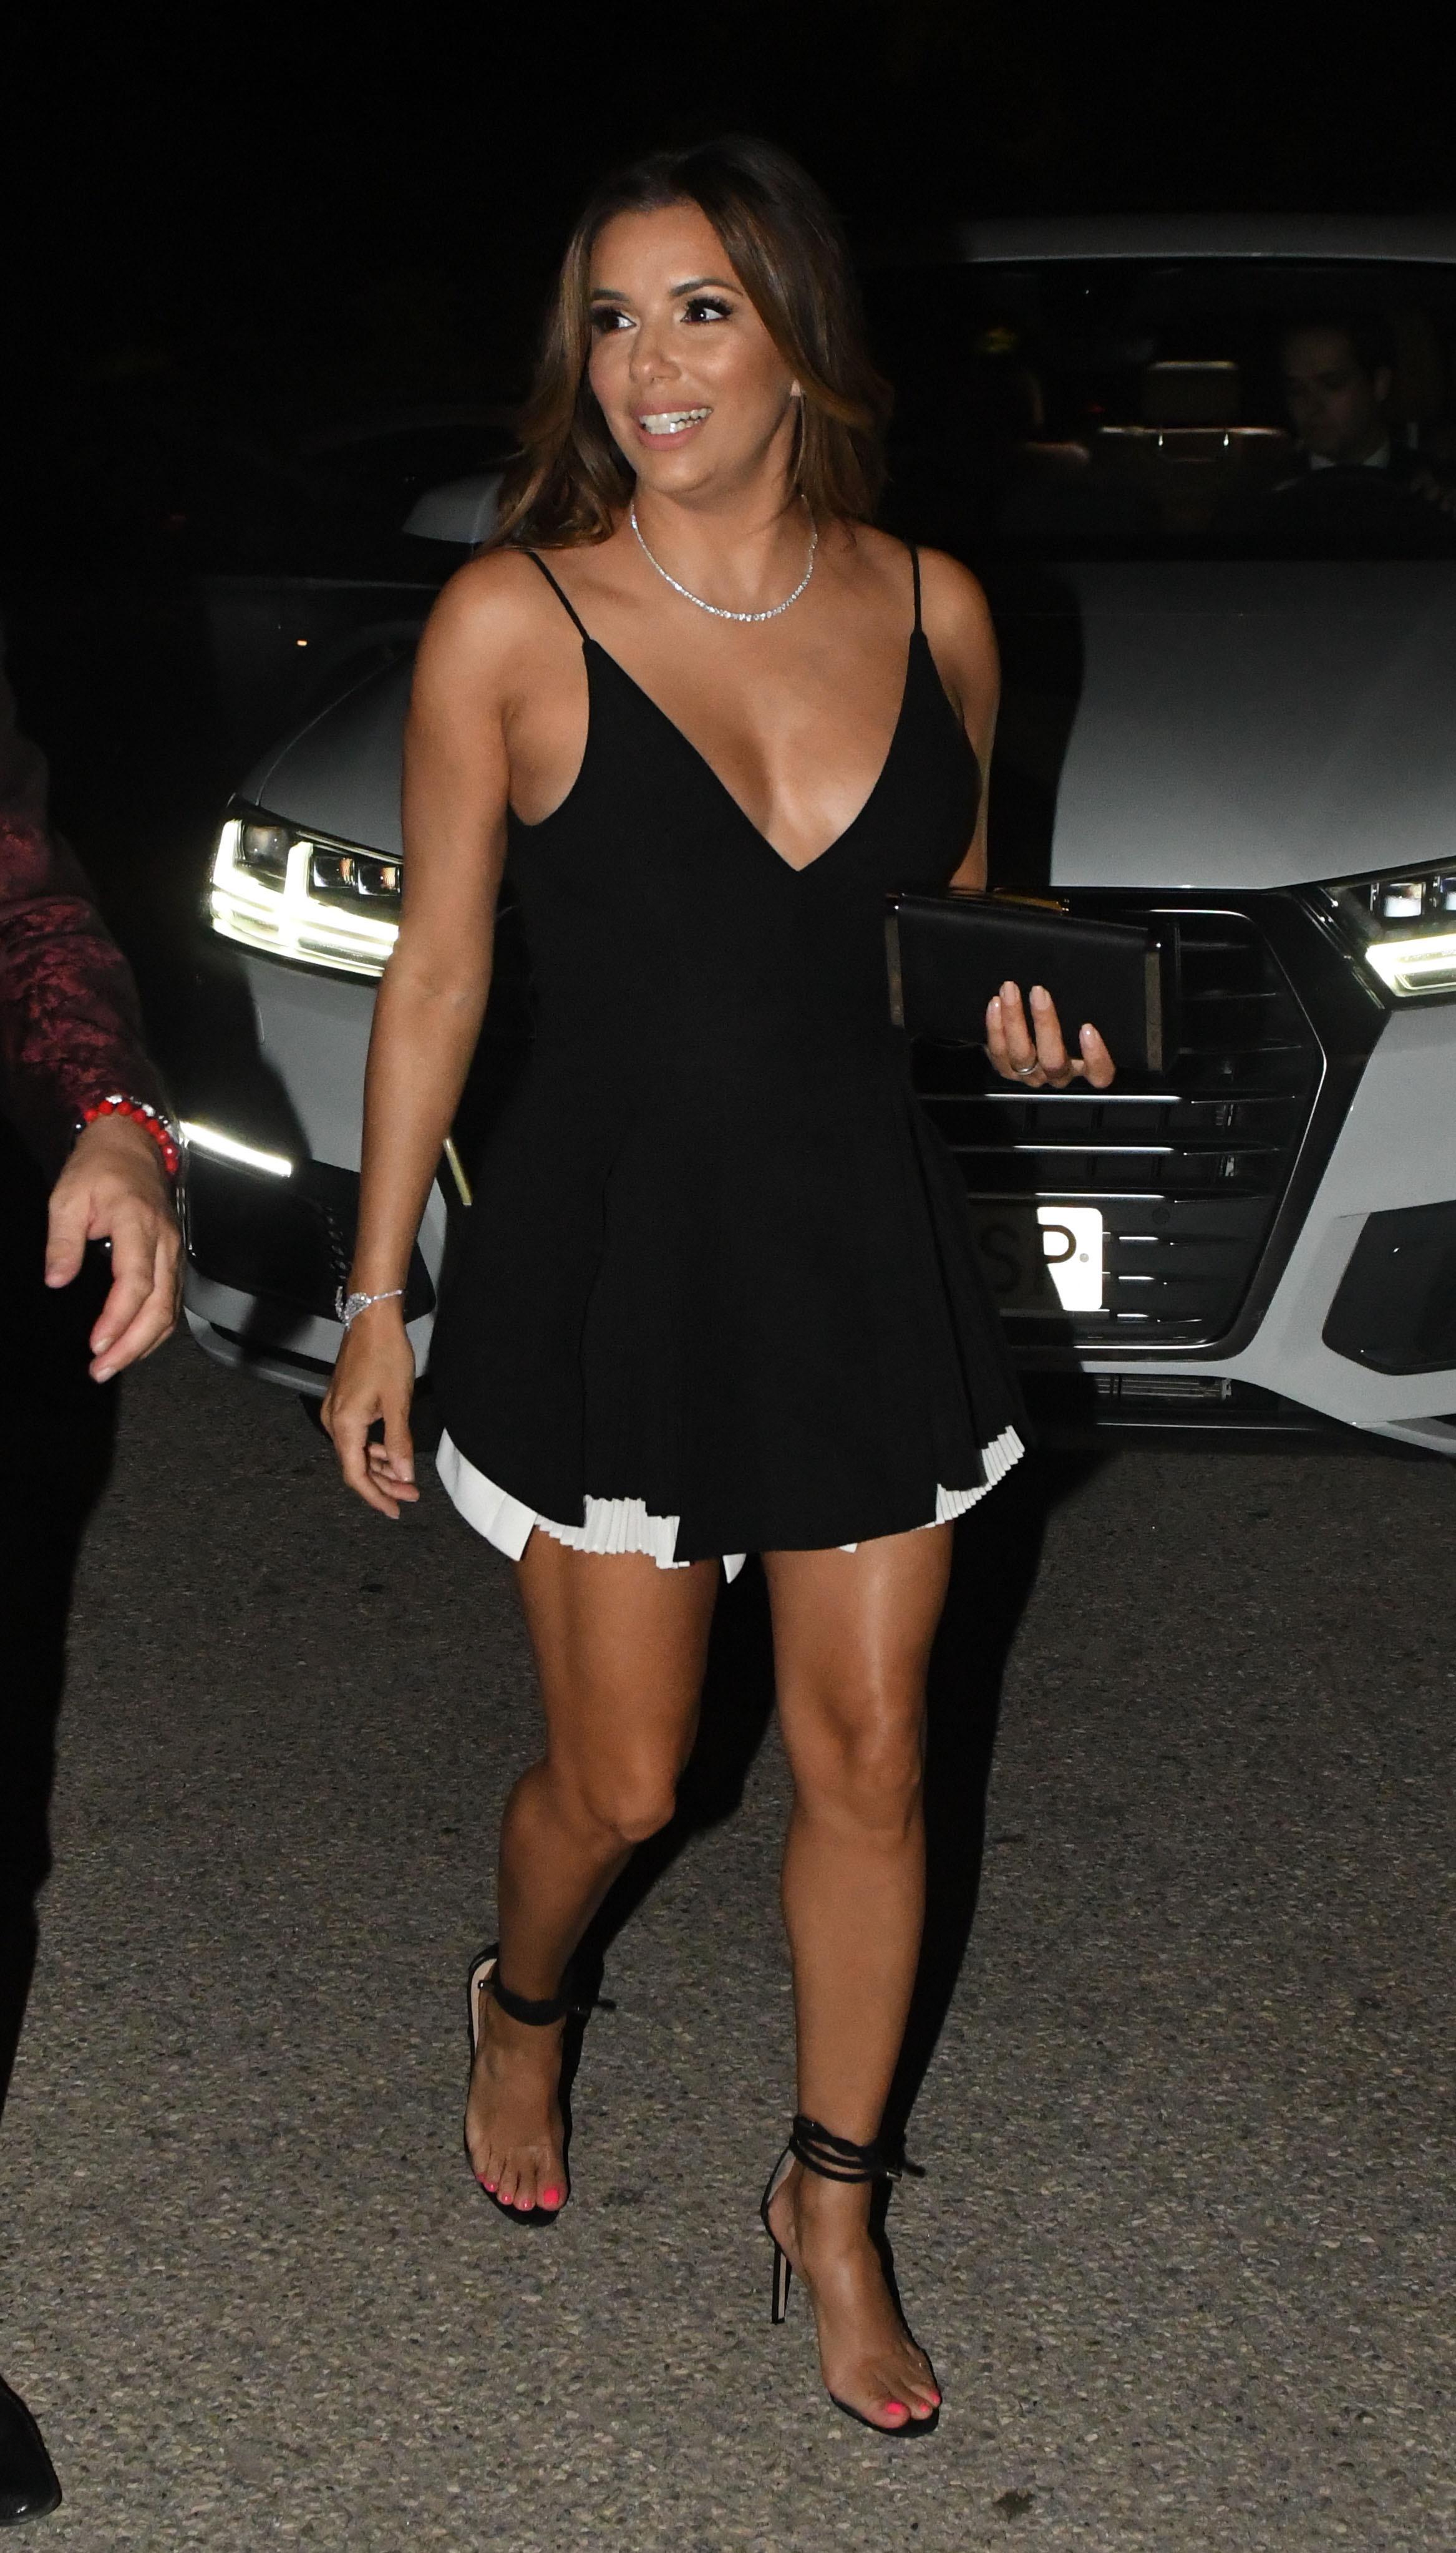 Eva mendes sexy legs